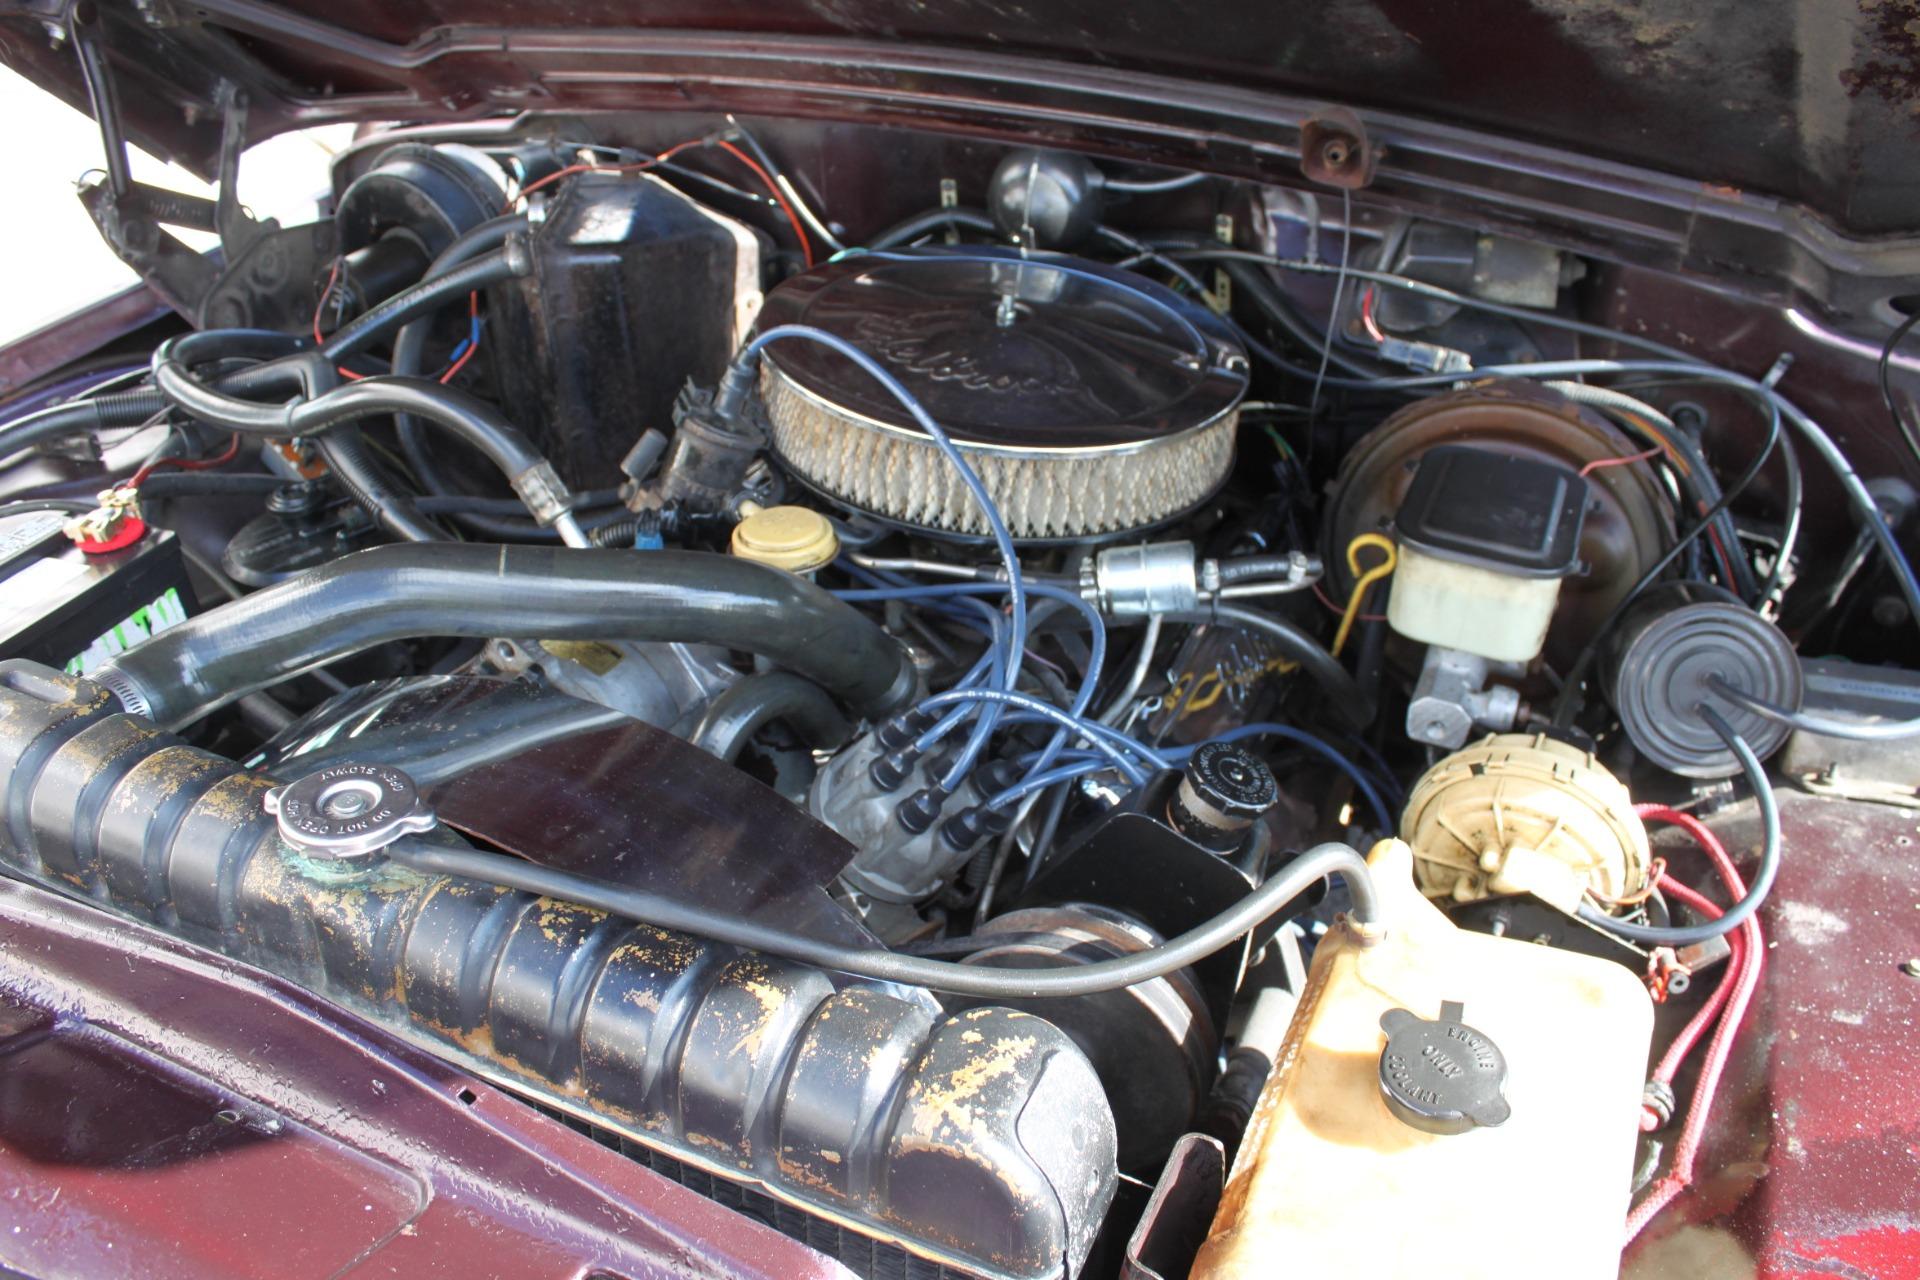 Used-1989-Jeep-Grand-Wagoneer-Camaro